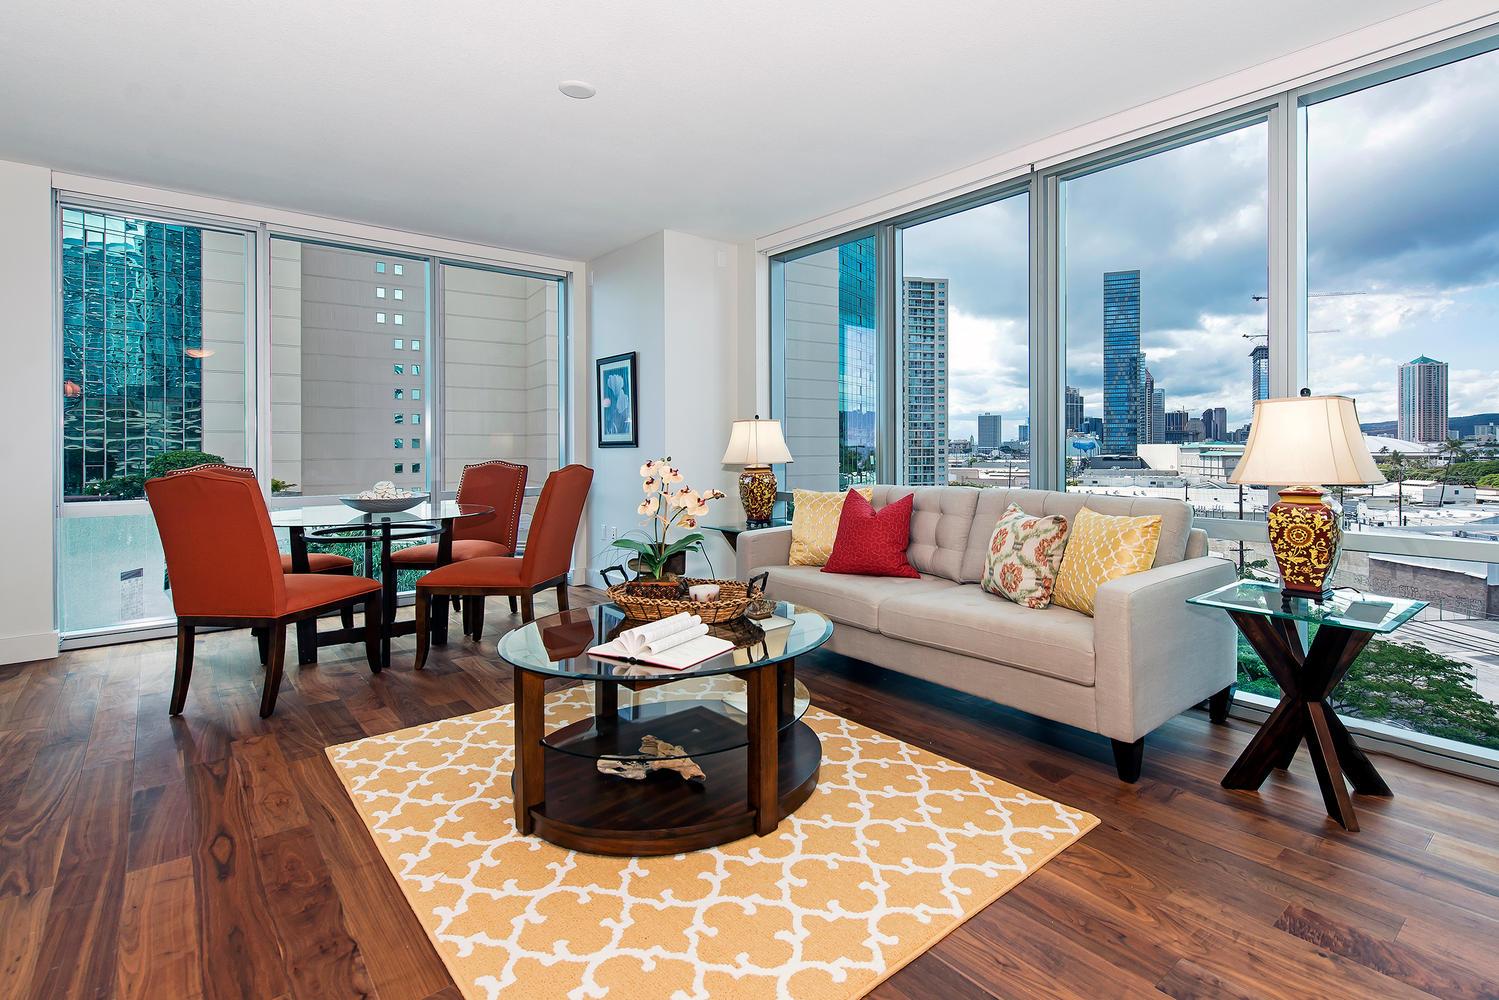 Condominium for Sale at Luxury Living 1189 Waimanu Street #709 Kakaako, Honolulu, Hawaii 96814 United States